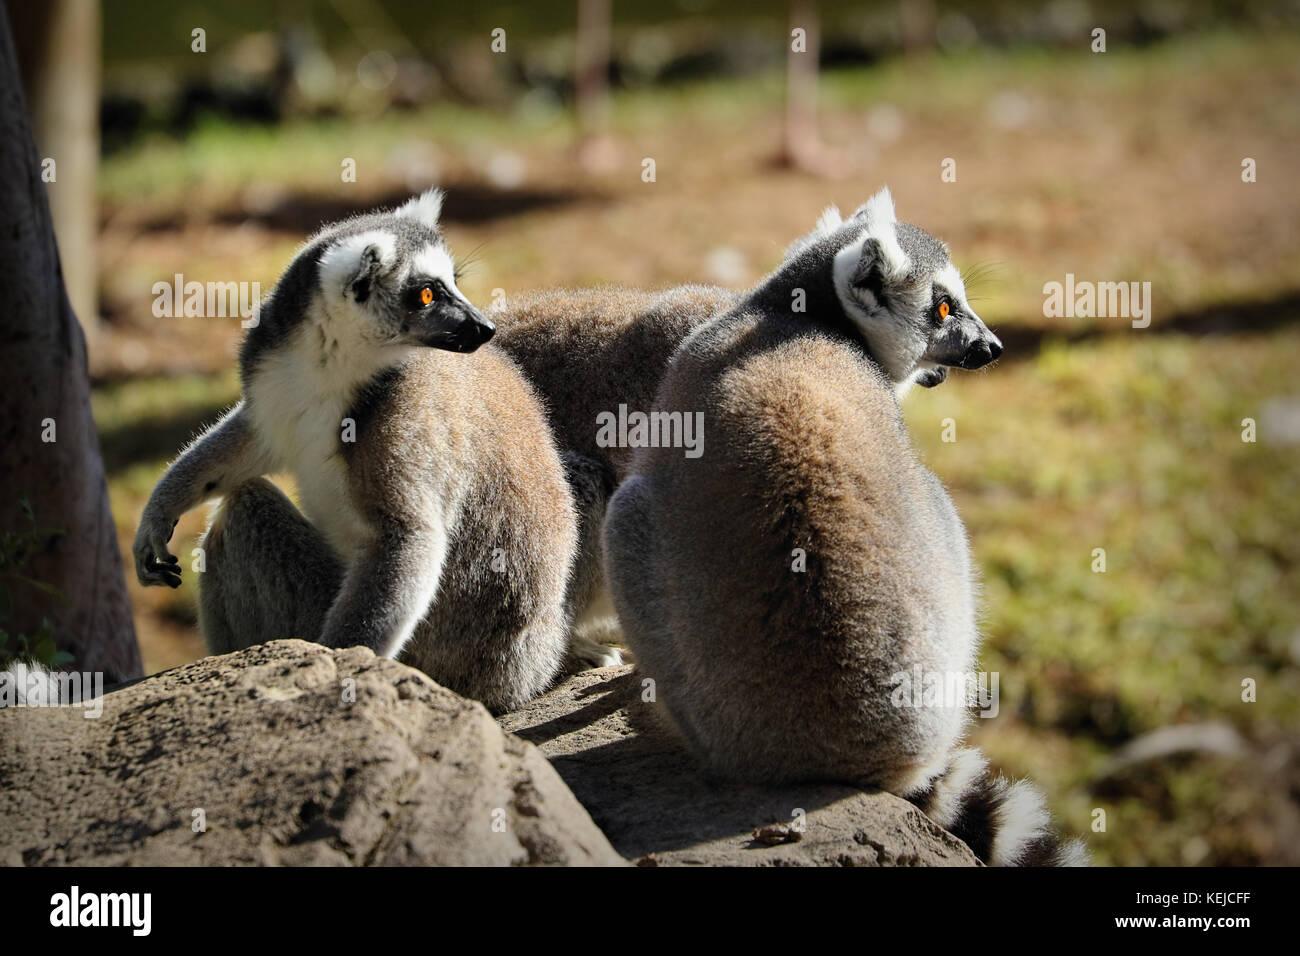 Ring-tailed lemur (lemur catta), South Africa - Stock Image